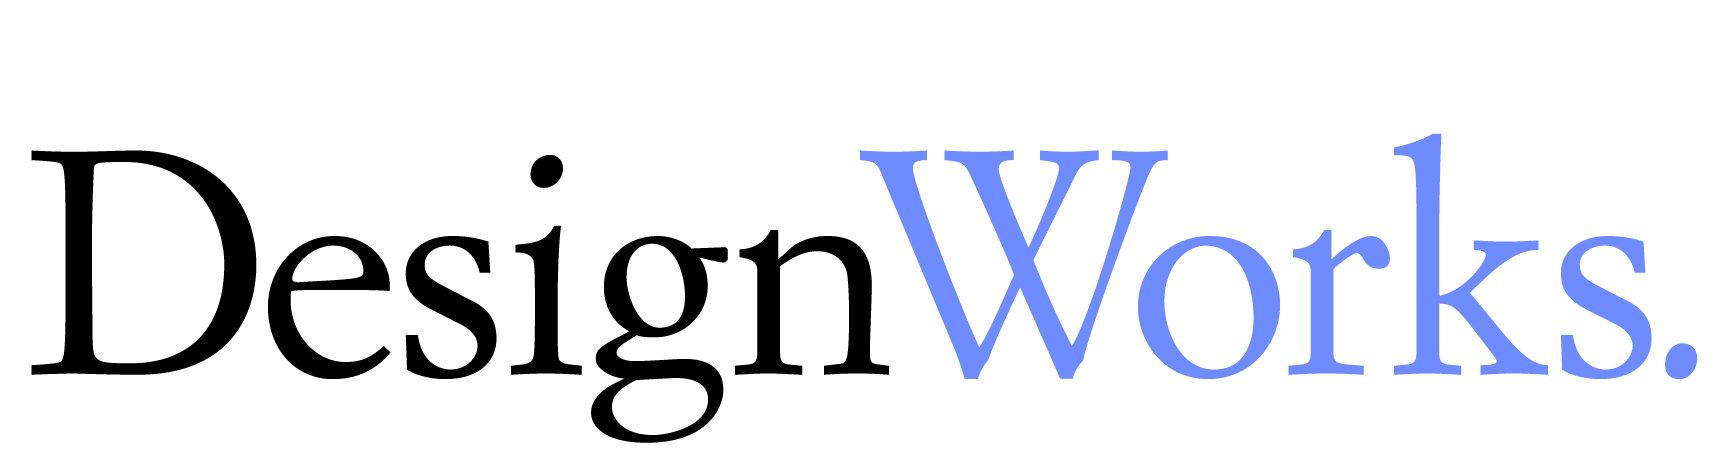 designWorkspurple_logo.jpg